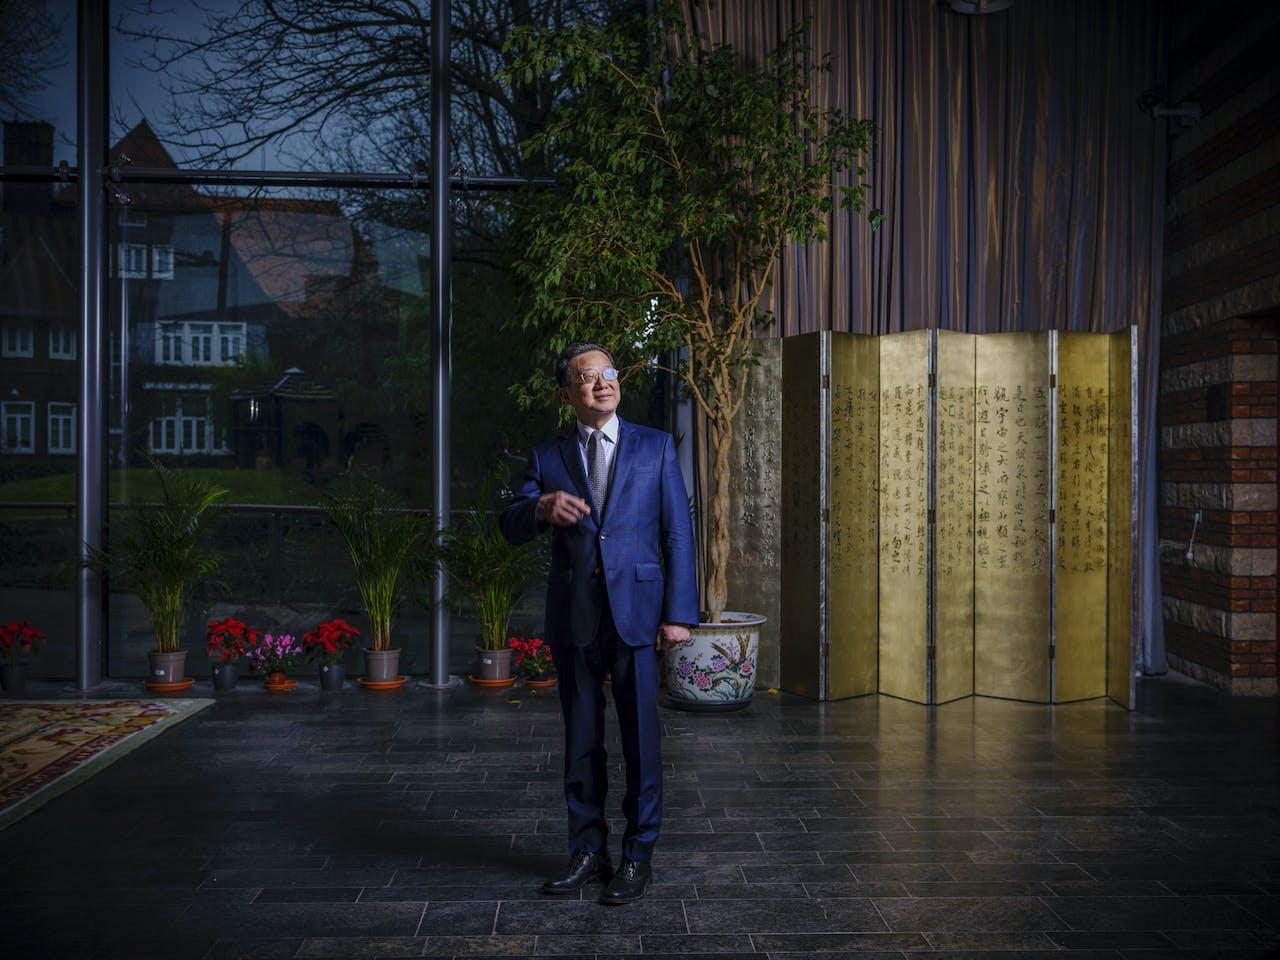 De nieuwe ambassadeur van China in Nederland, Xu Hong.